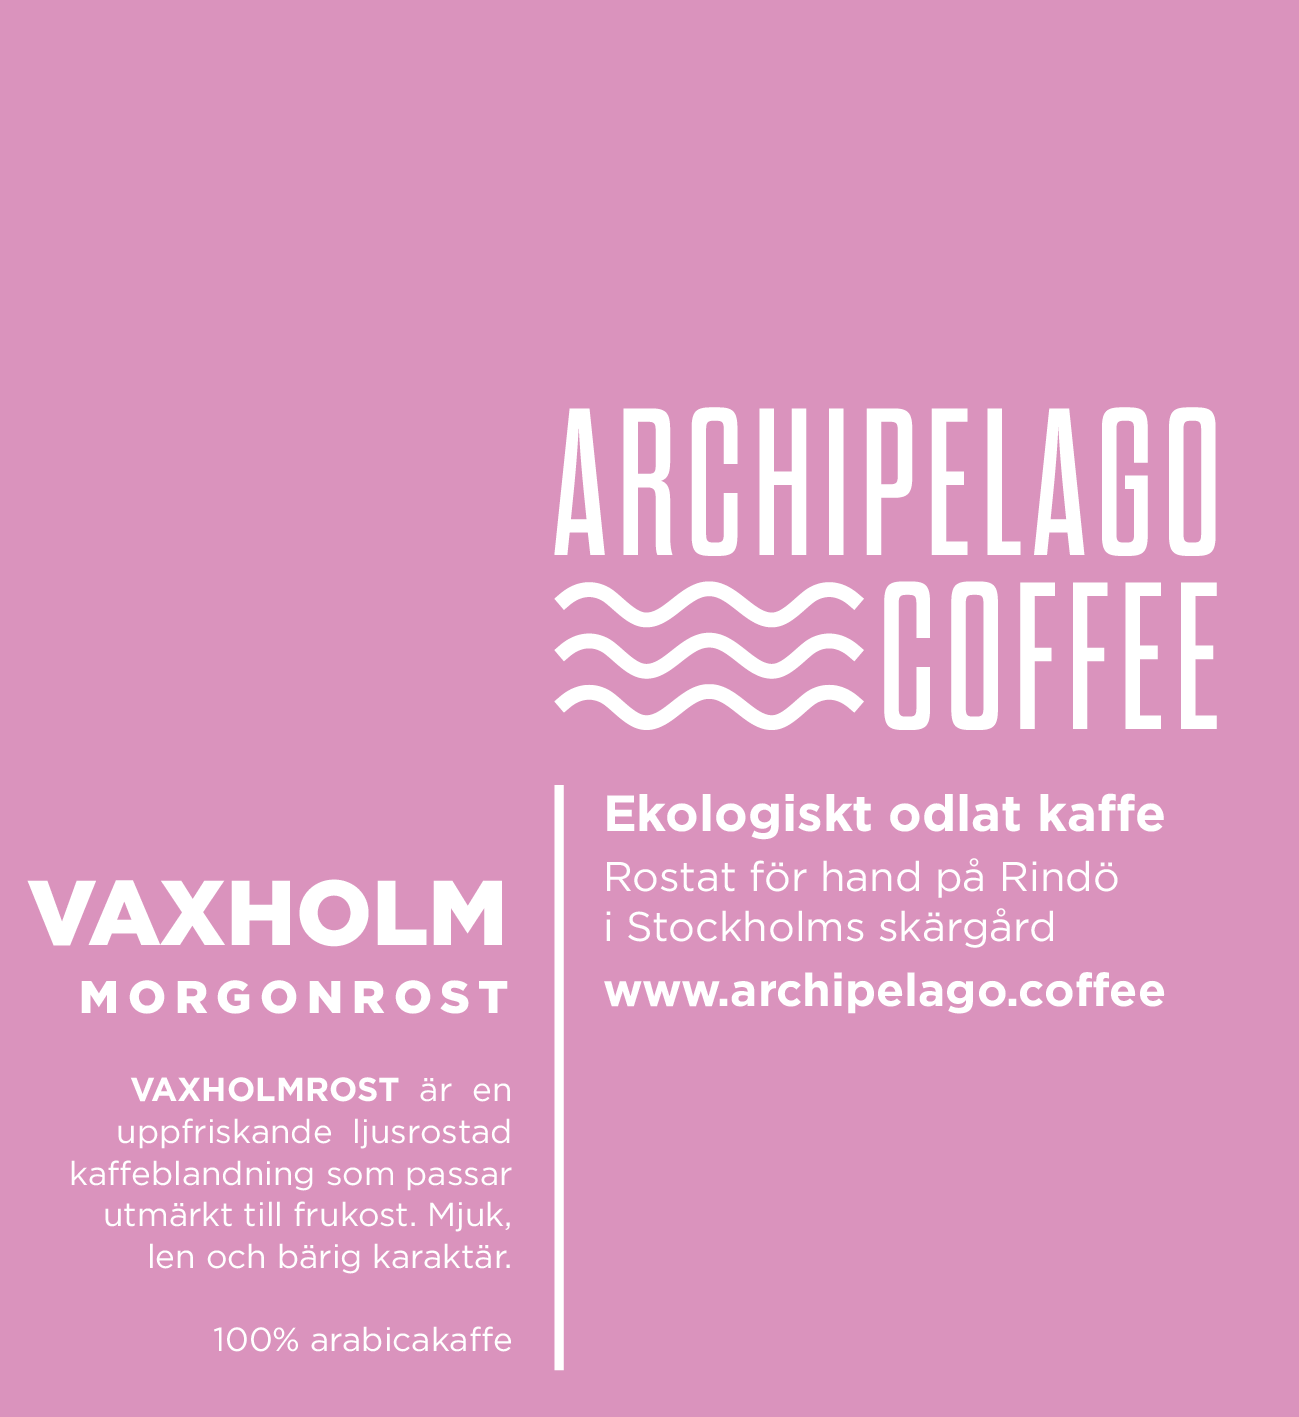 Vaxholm kaffe